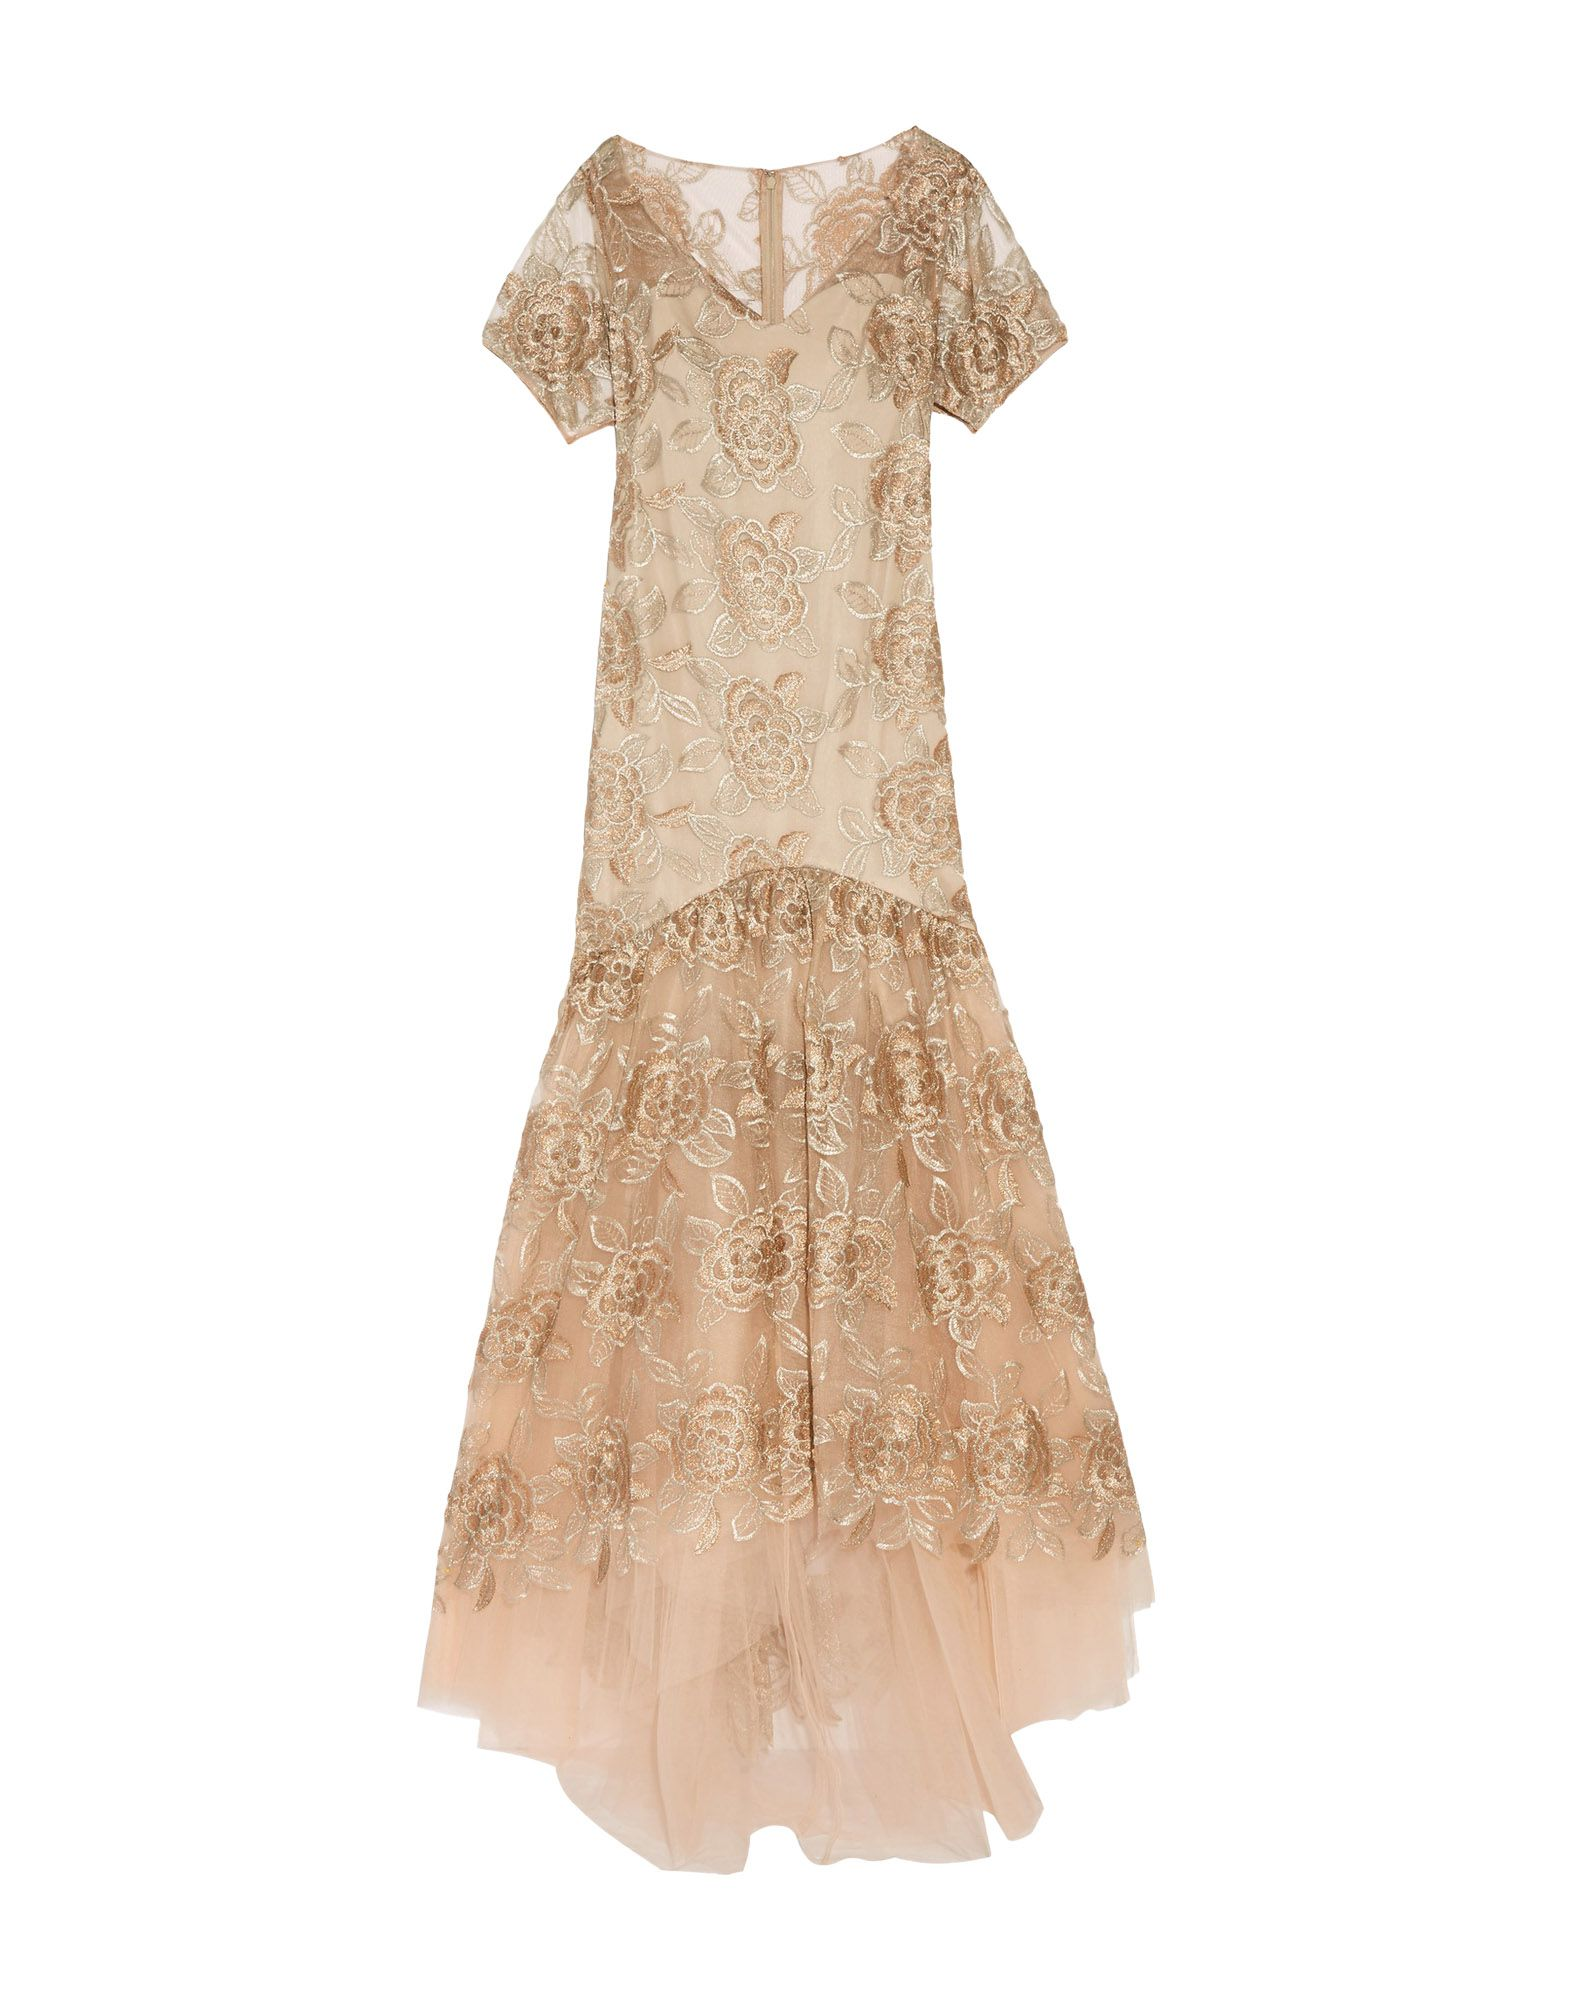 Фото - MIKAEL AGHAL Длинное платье mikael aghal юбка до колена